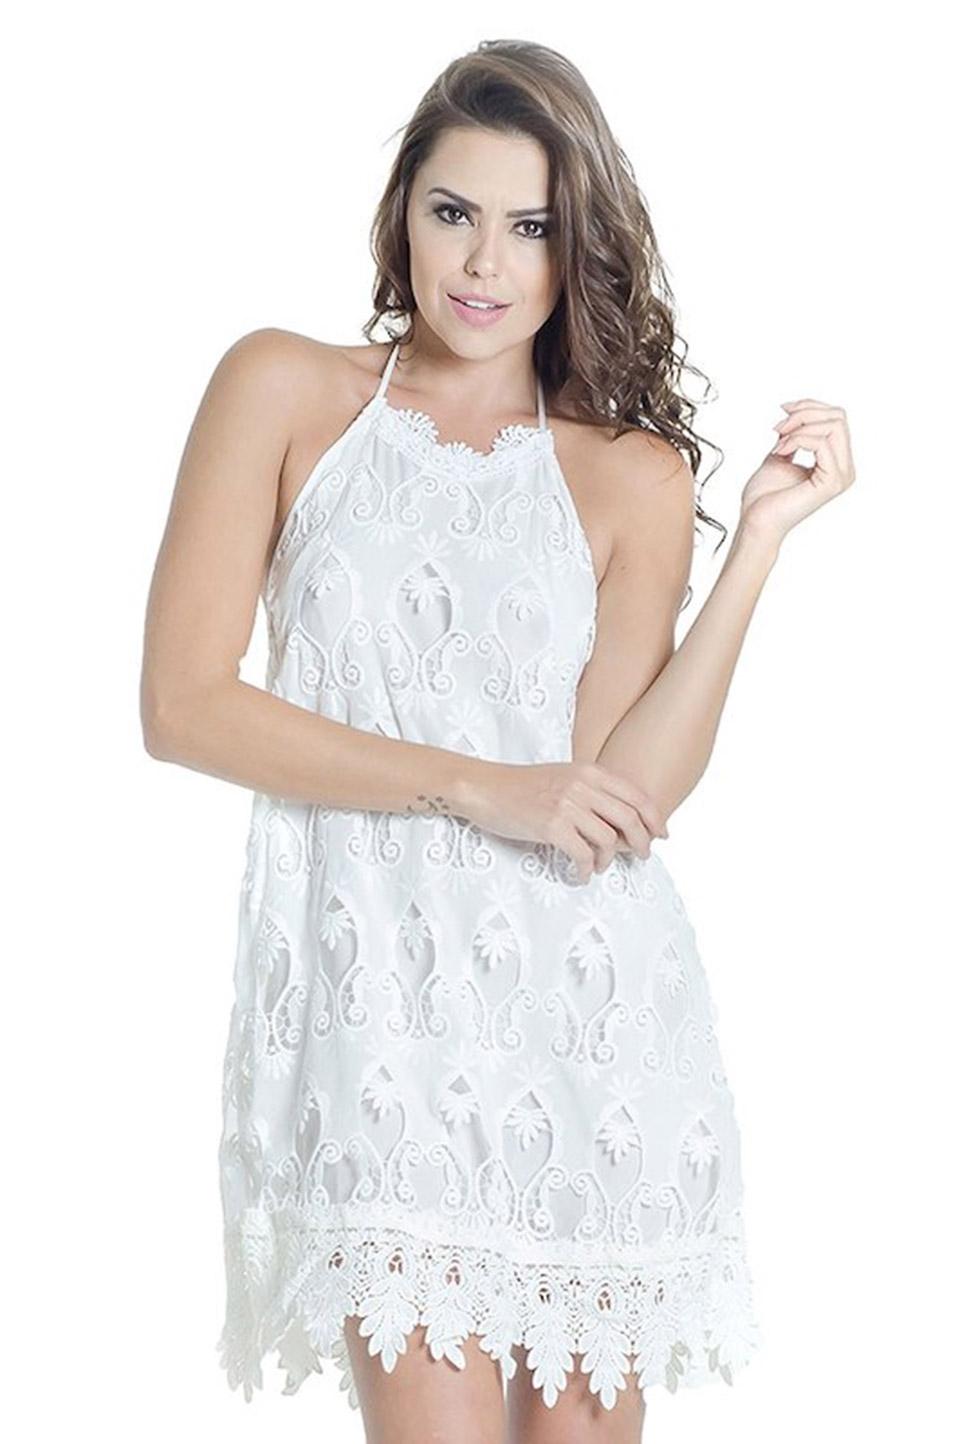 66d900a571 Vestido Branco  O seu guia Completo!